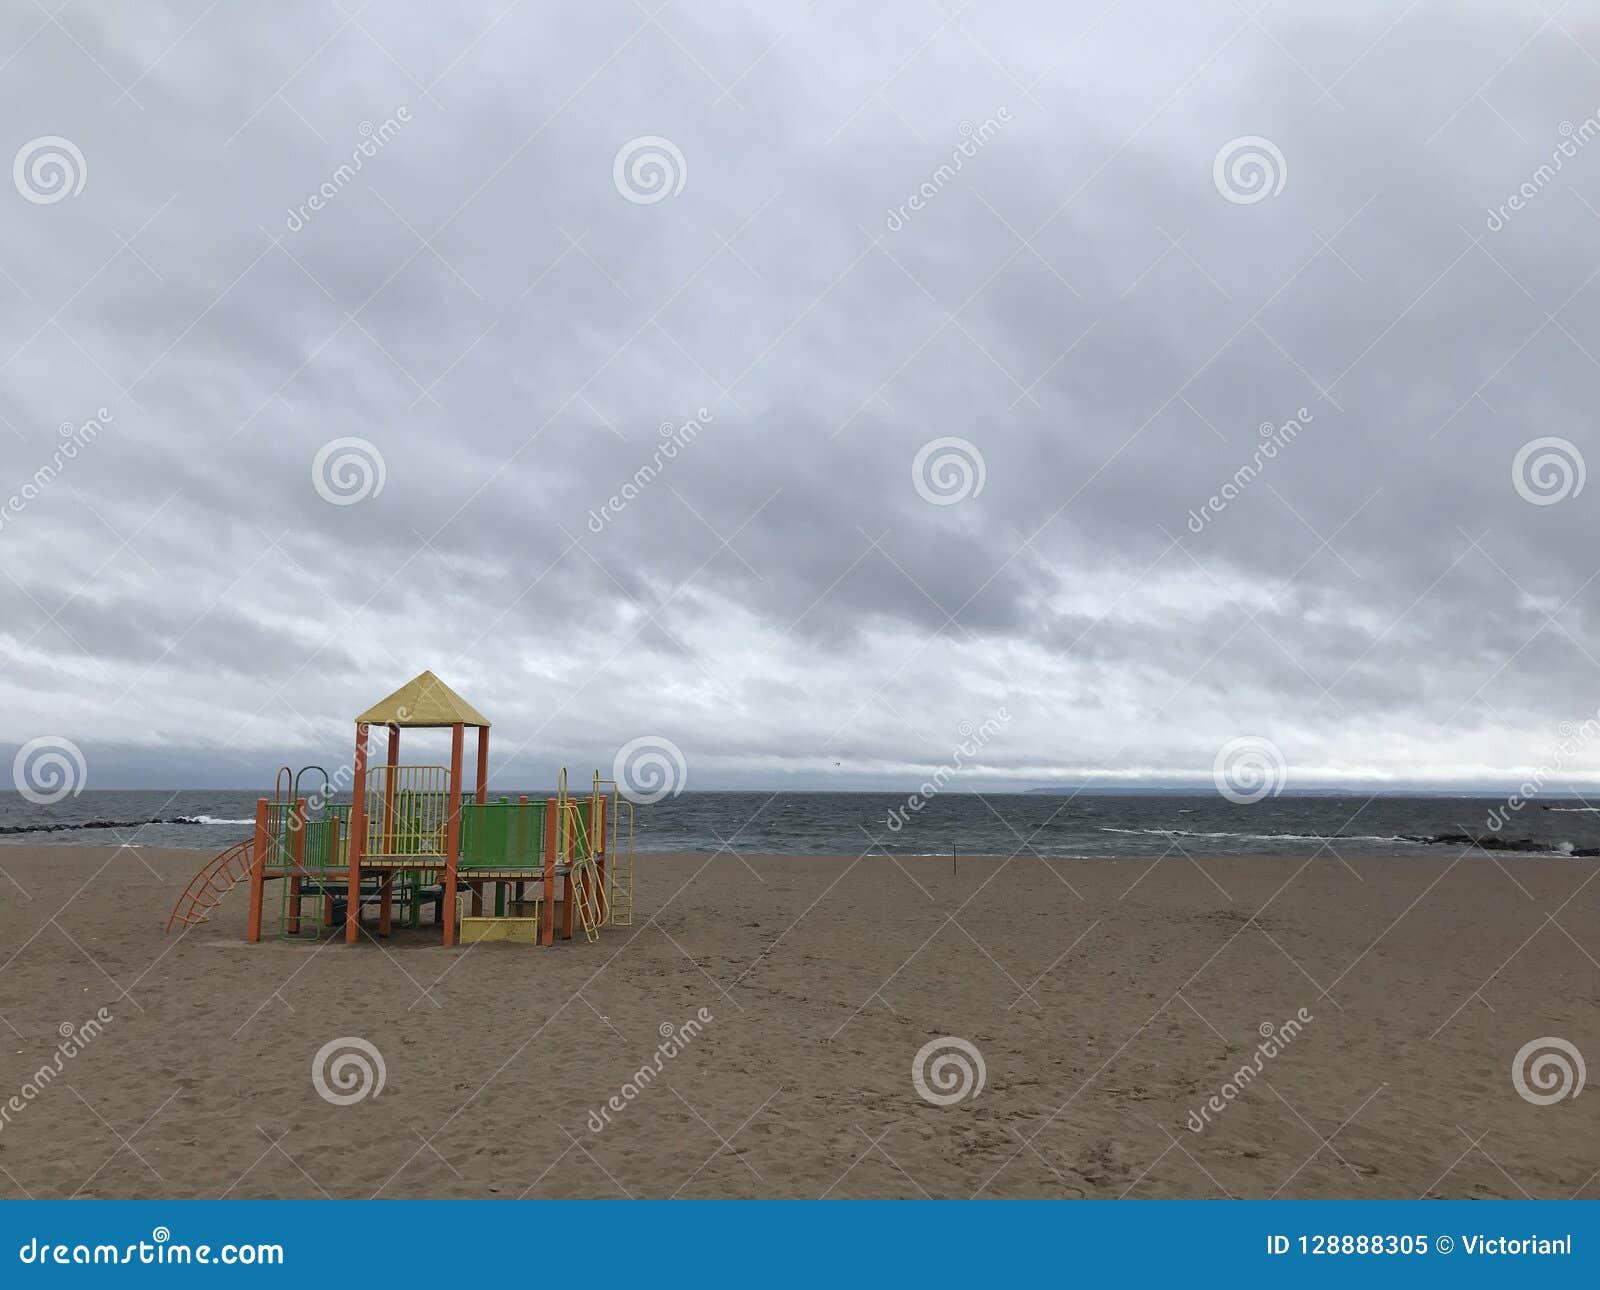 Atlantic Ocean In The Autumn Nyc Stock Image Image Of Ocean